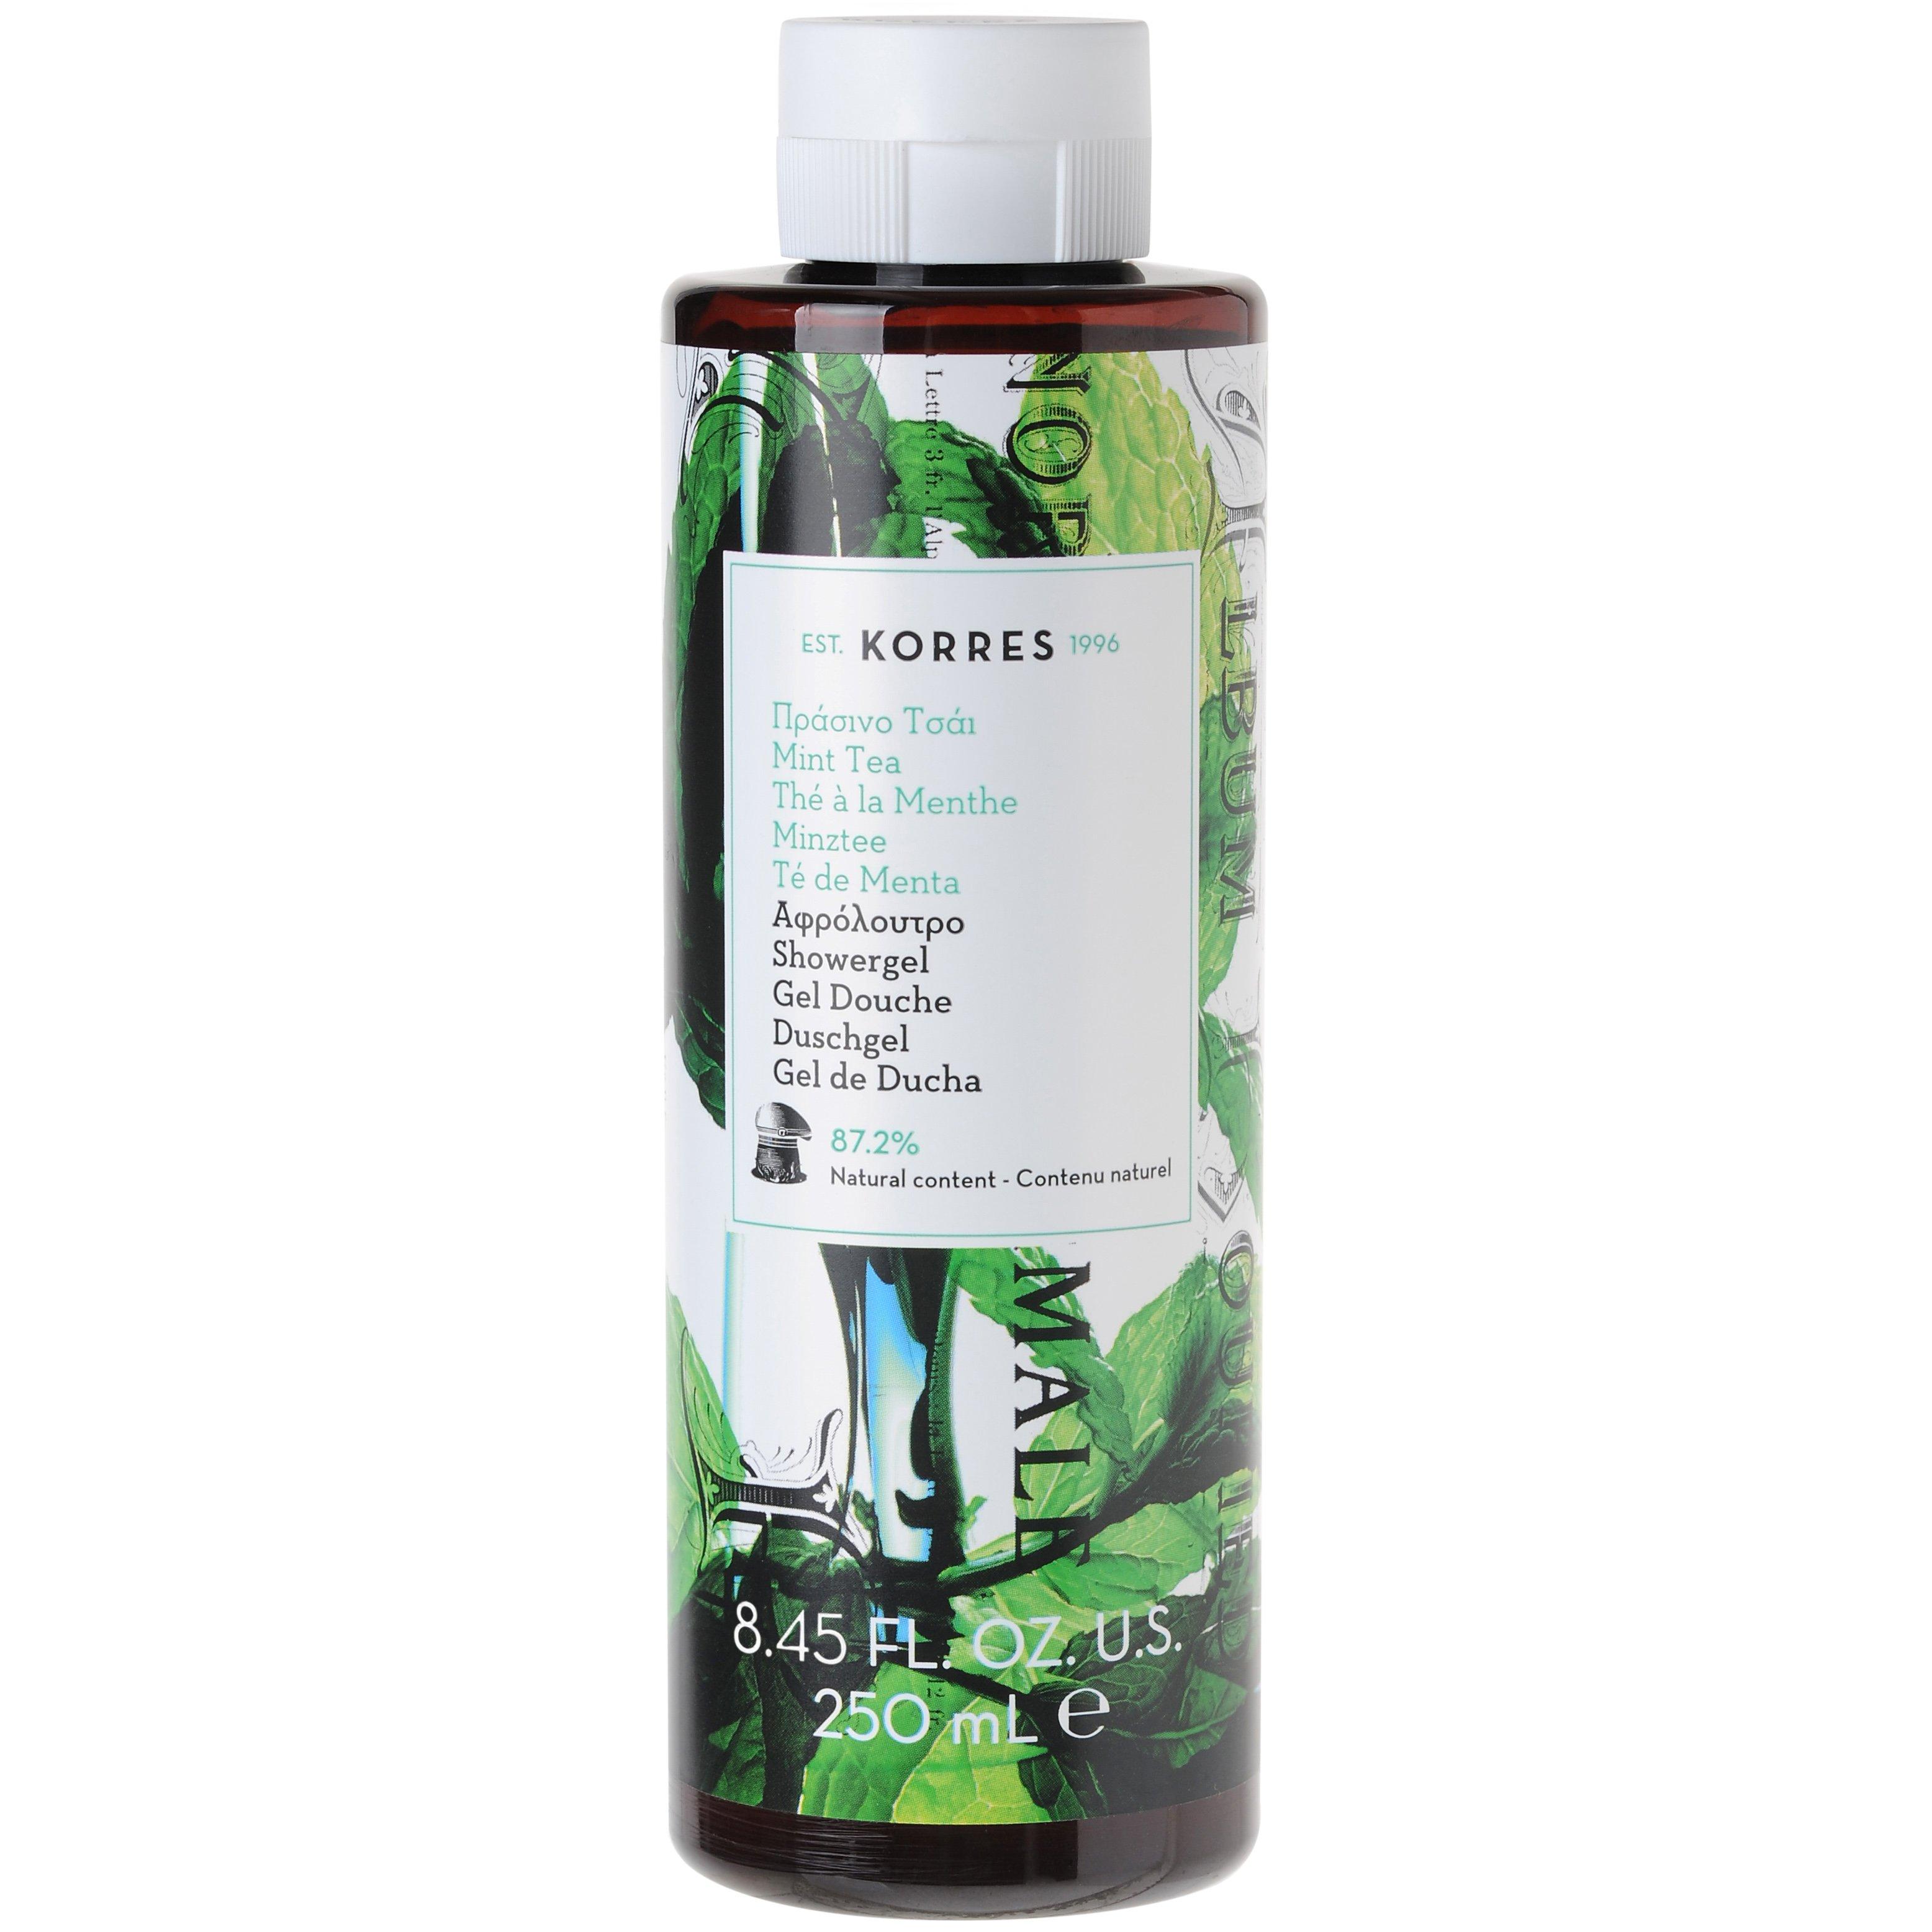 Korres Πράσινο Τσάι Οικείο, Δροσερό &Ξεχωριστό Αφρόλουτρο 250ml